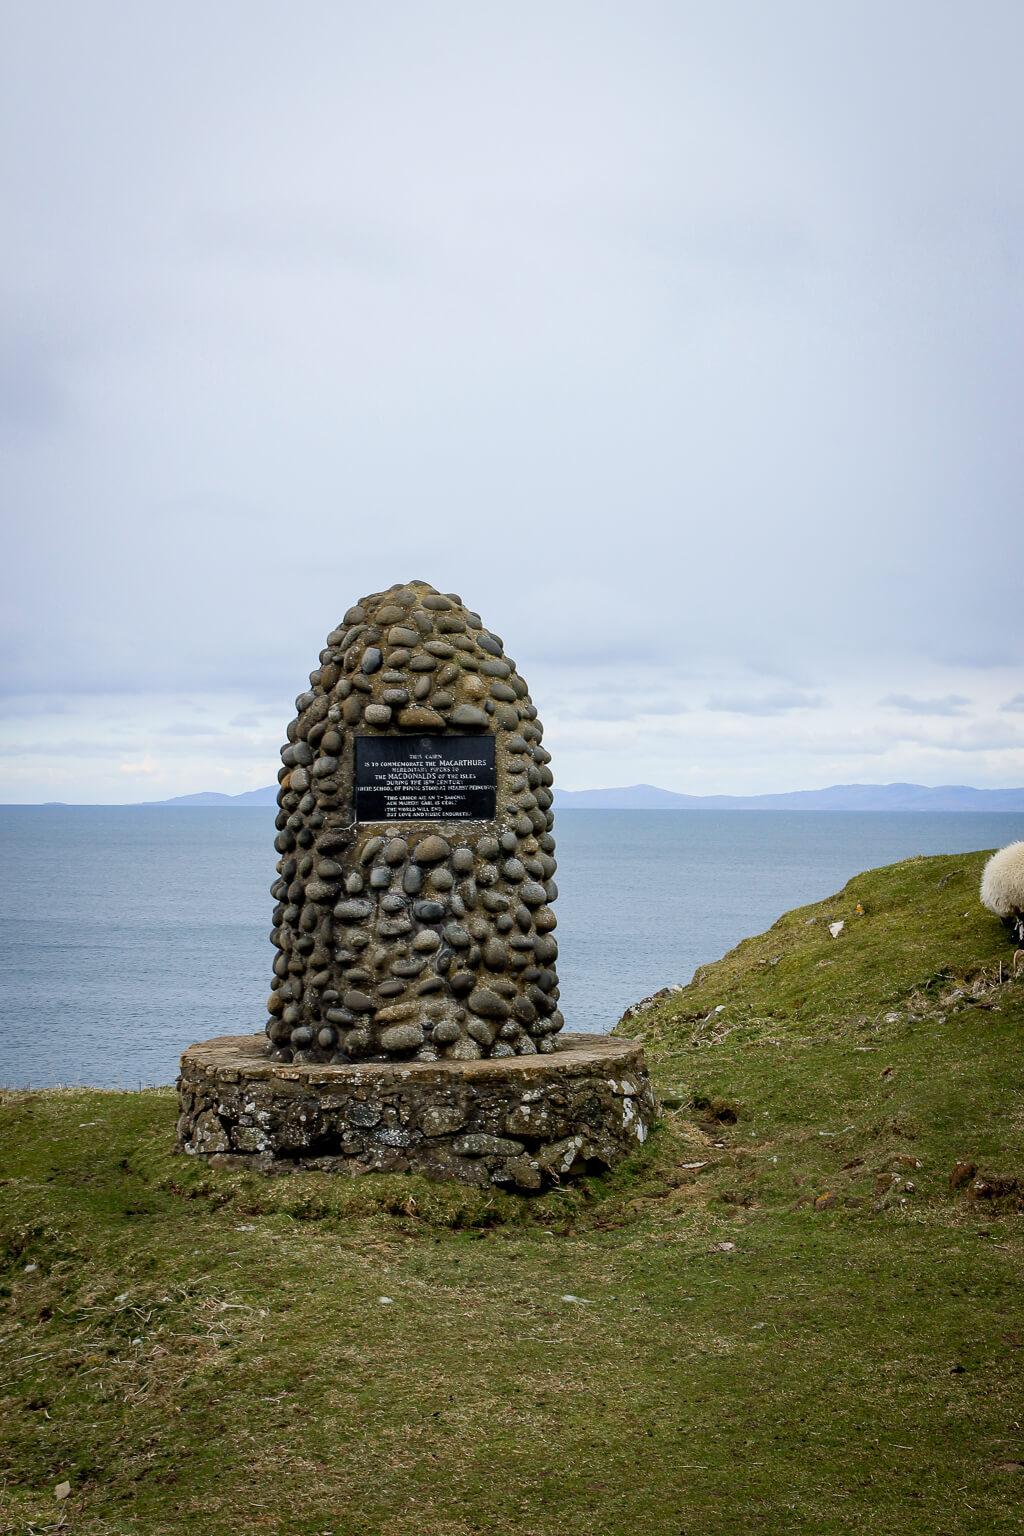 Isle of Skye Schottland Sehenswürdigkeiten Duntulm Viewpoint Castle tantedine